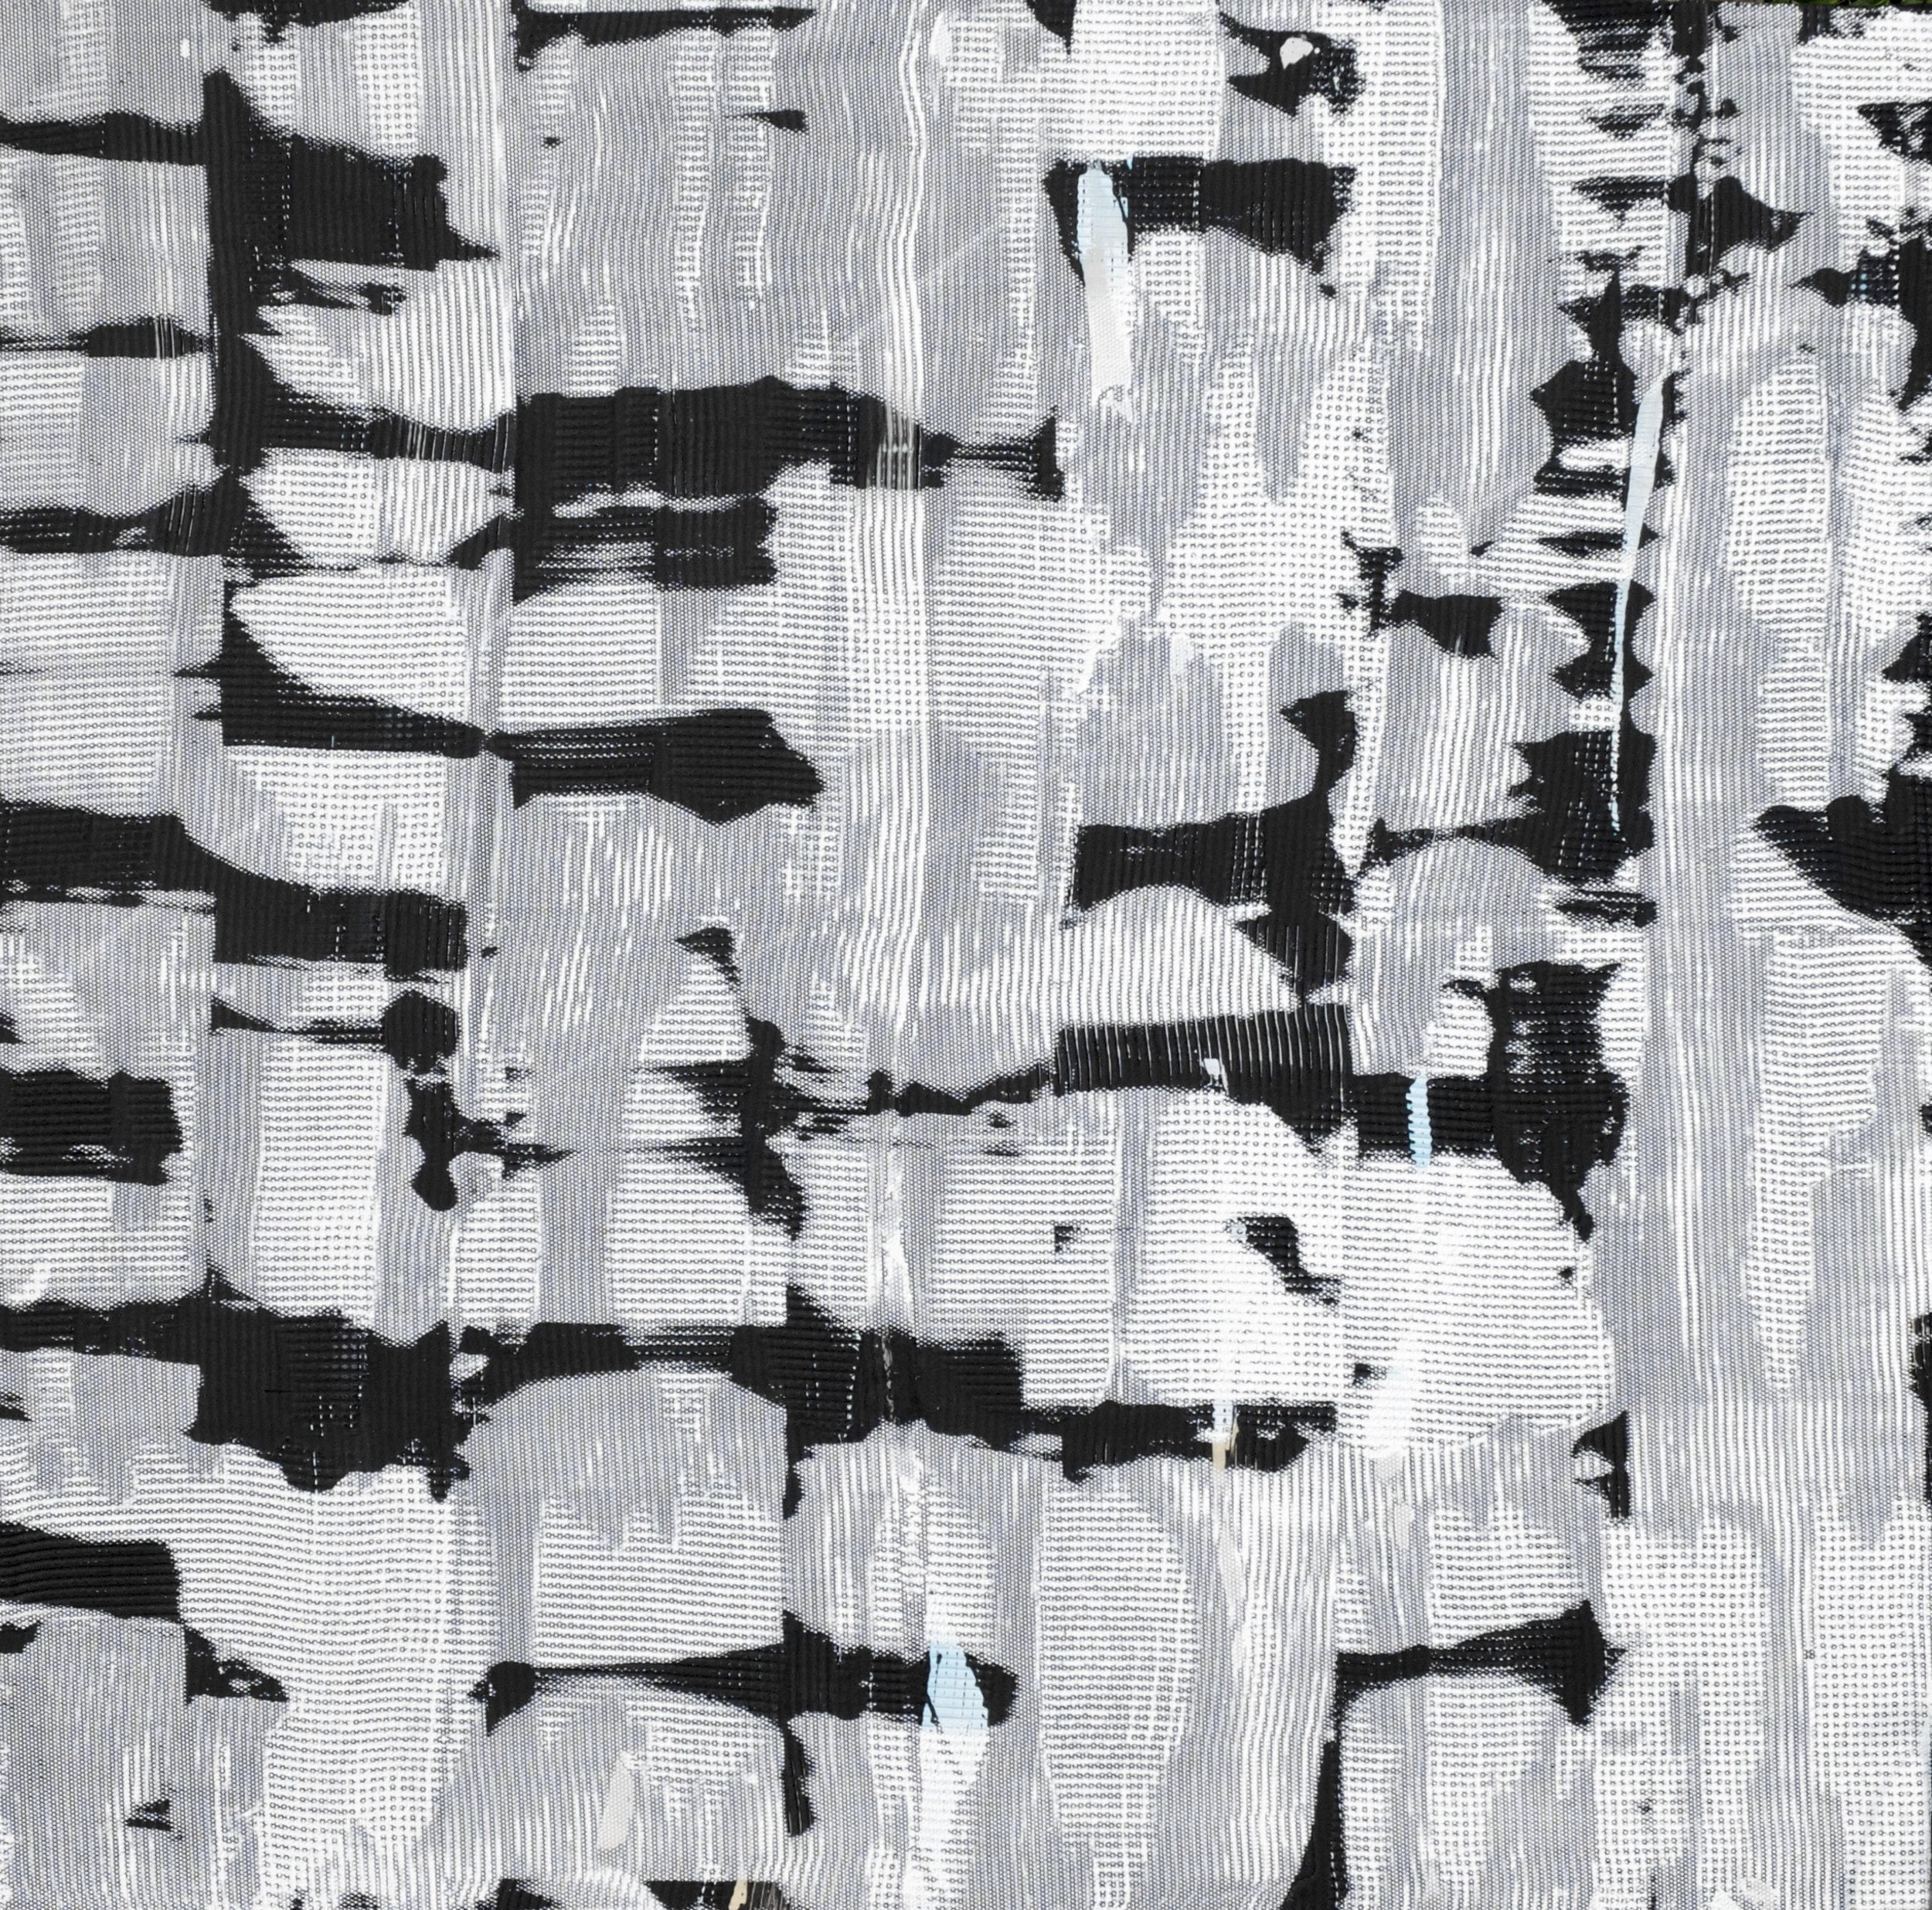 Warren Greene, Bellicose Binary, 2015. Acrylic and oil on panel, 36 x 36 inches.